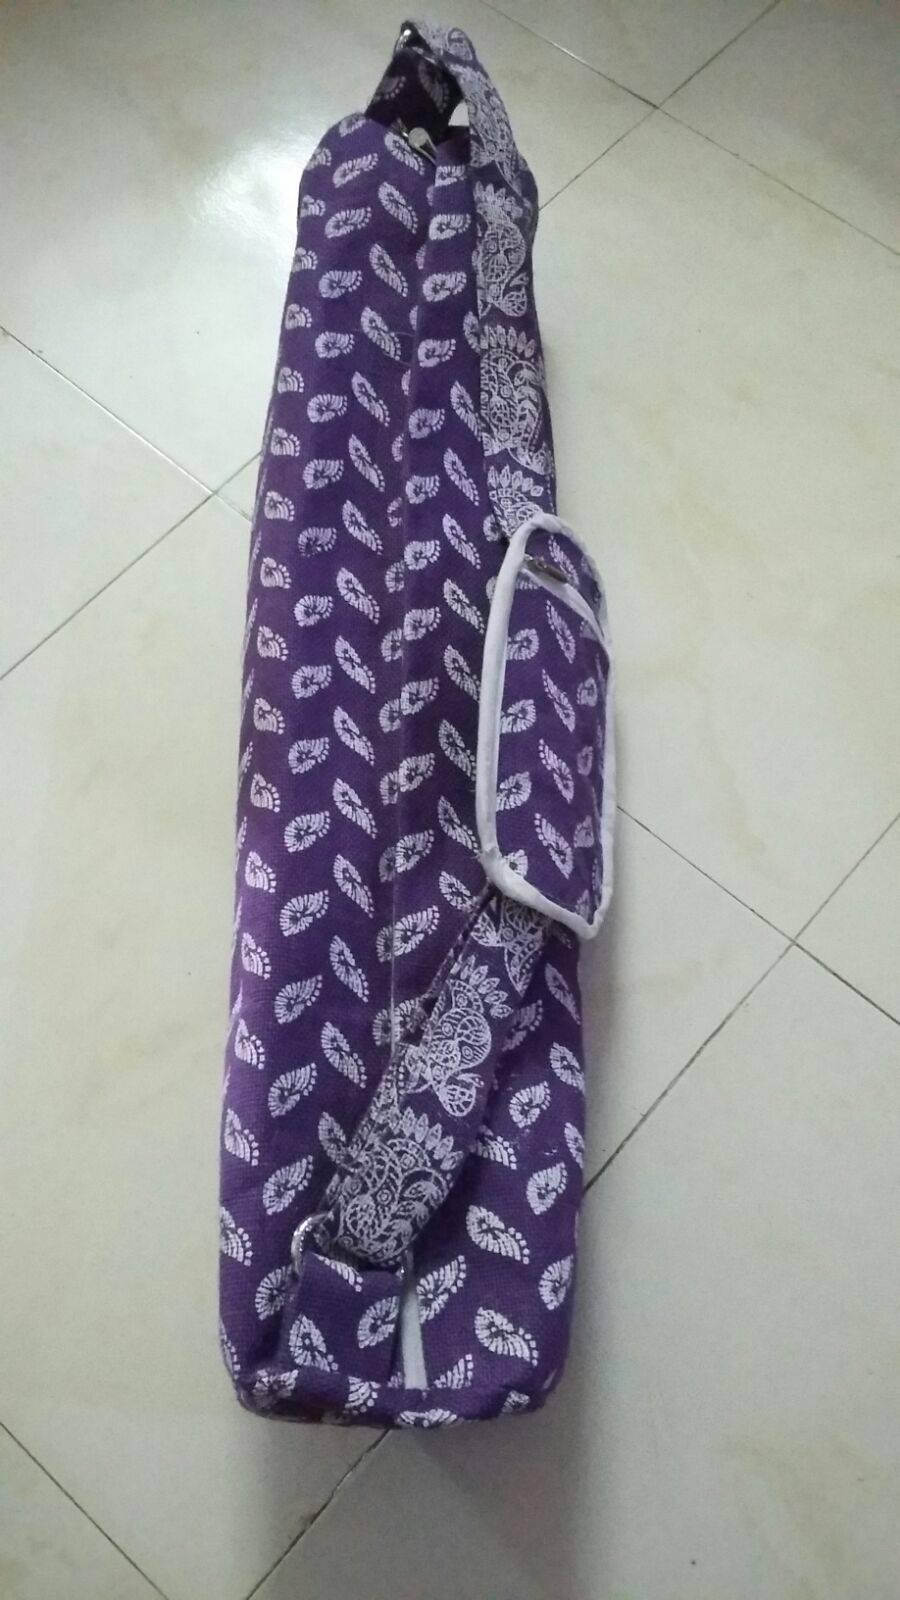 Yoga Mat Bags - Jute